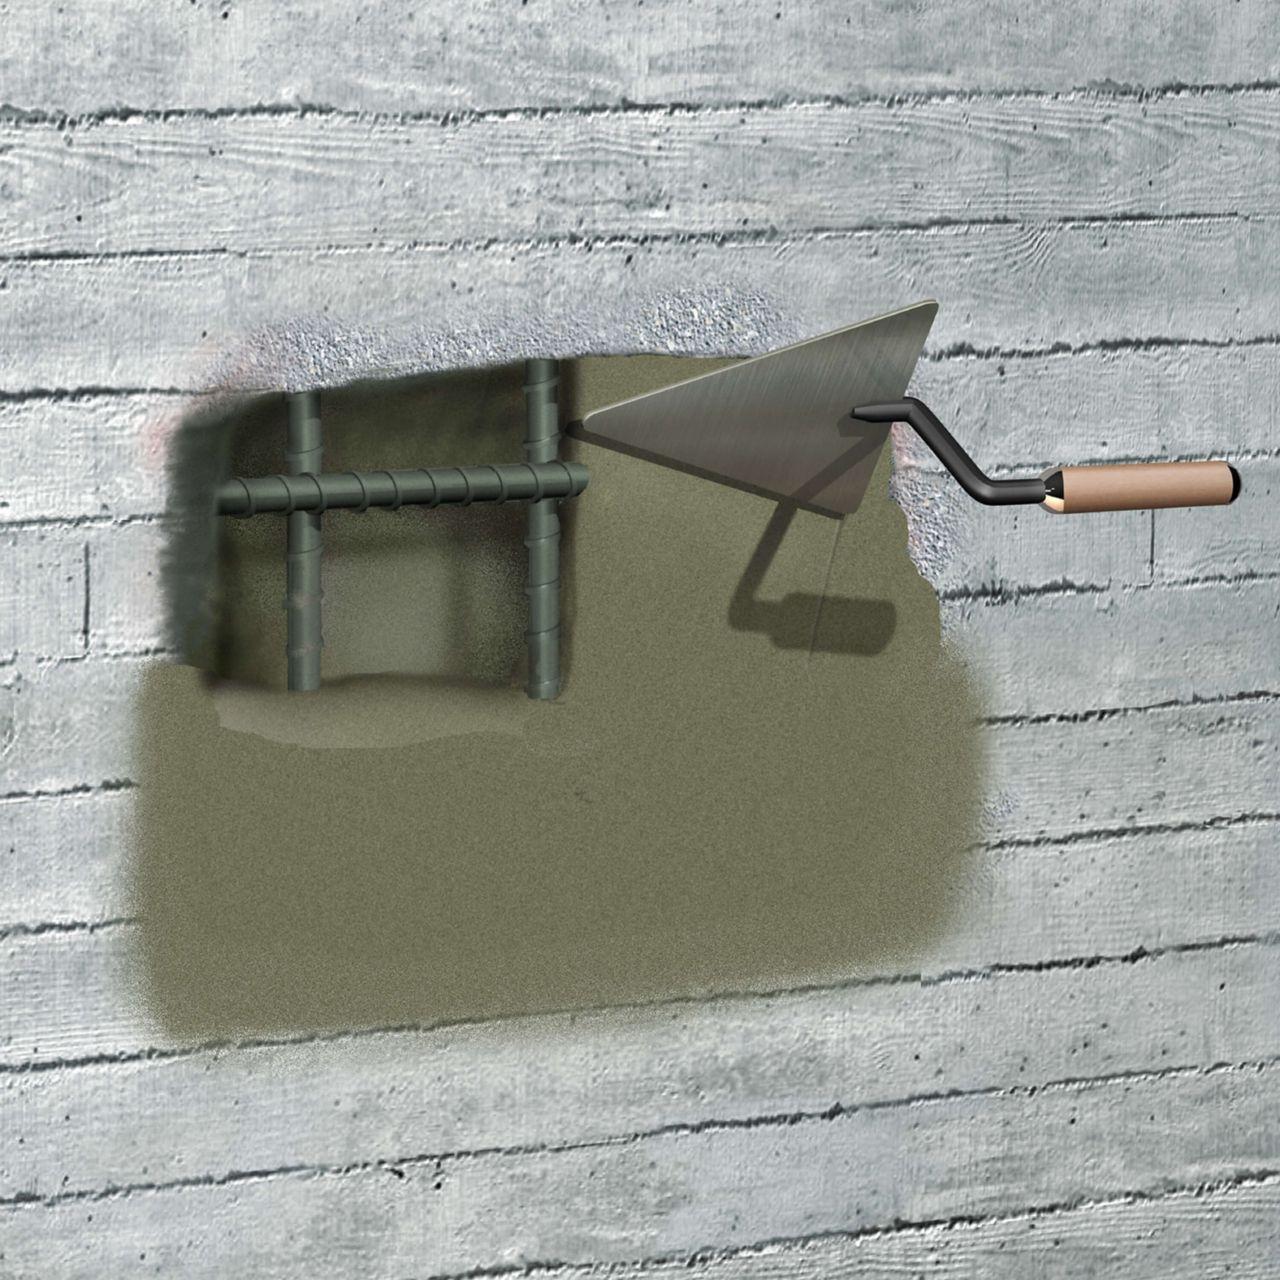 Concrete repair mortar being applied